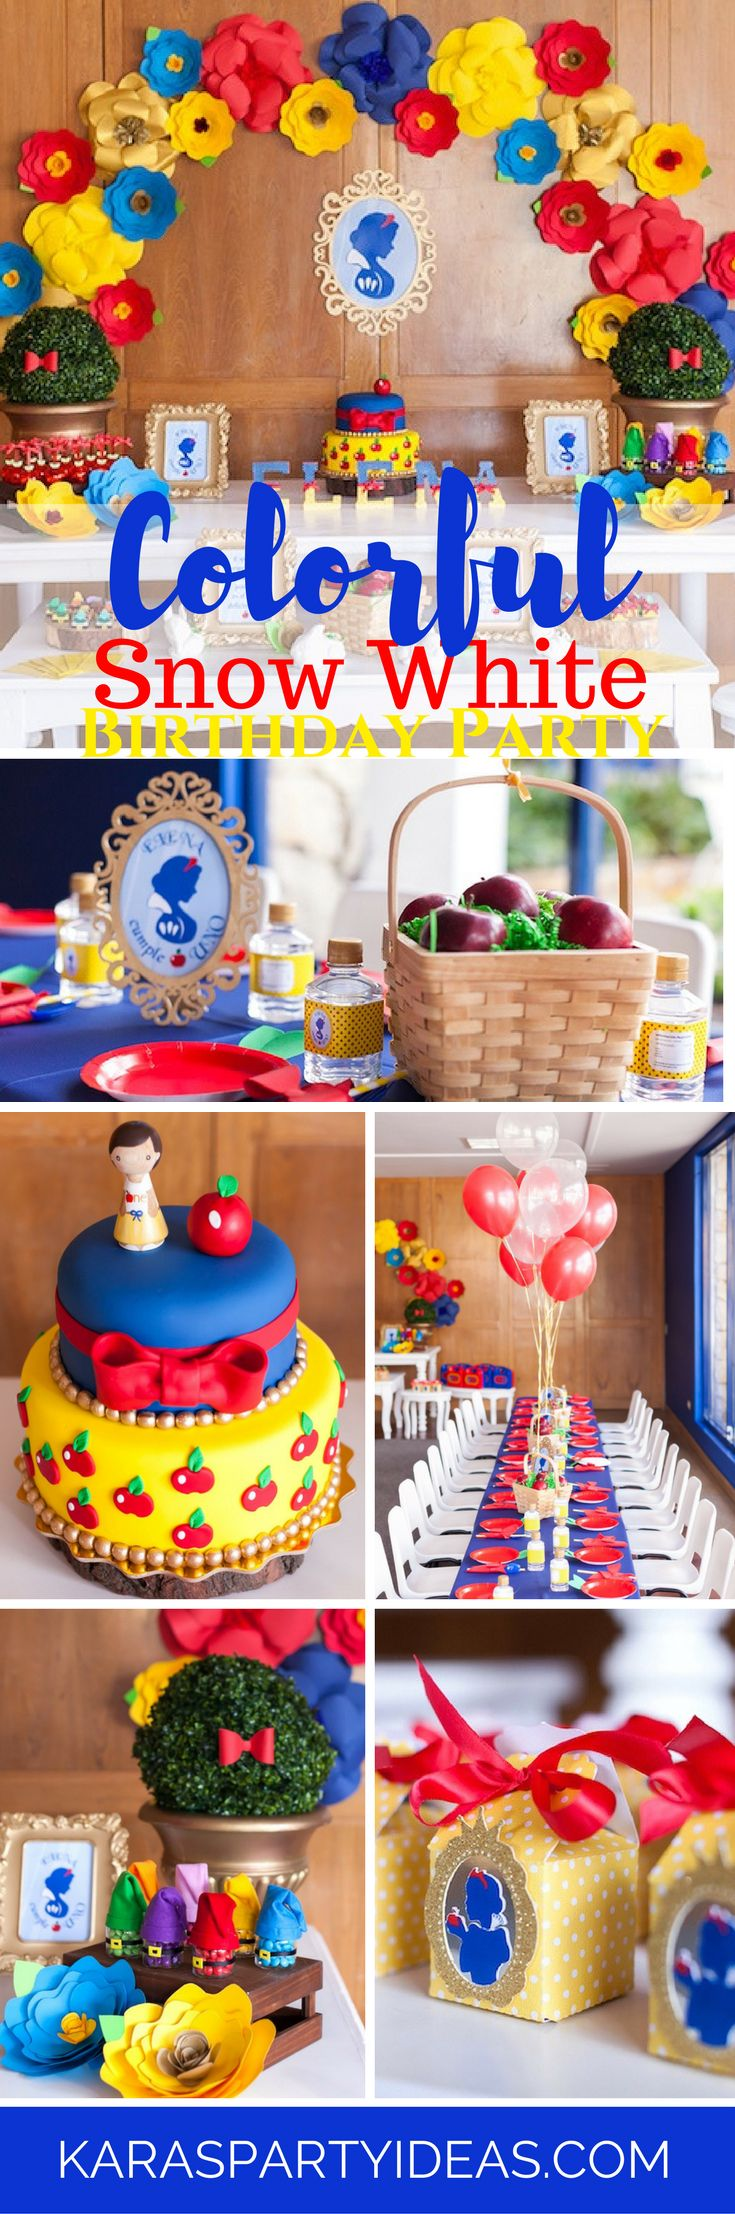 Colorful Snow White Birthday Party via Kara's Party Ideas - KarasPartyIdeas.com